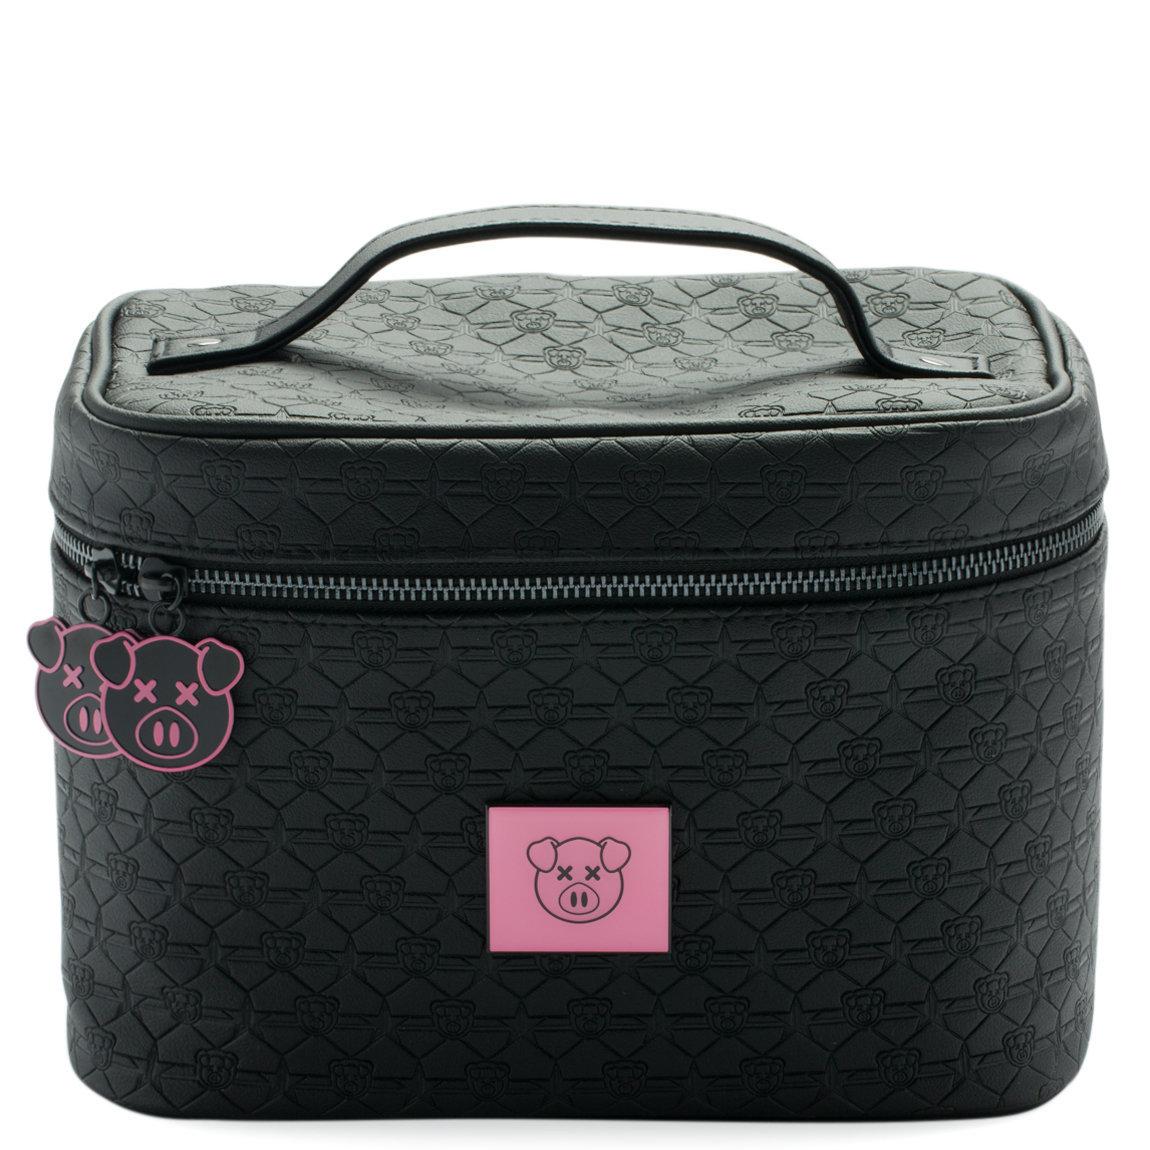 Jeffree Star Cosmetics Shane Dawson Imprint Travel Bag alternative view 1 - product swatch.